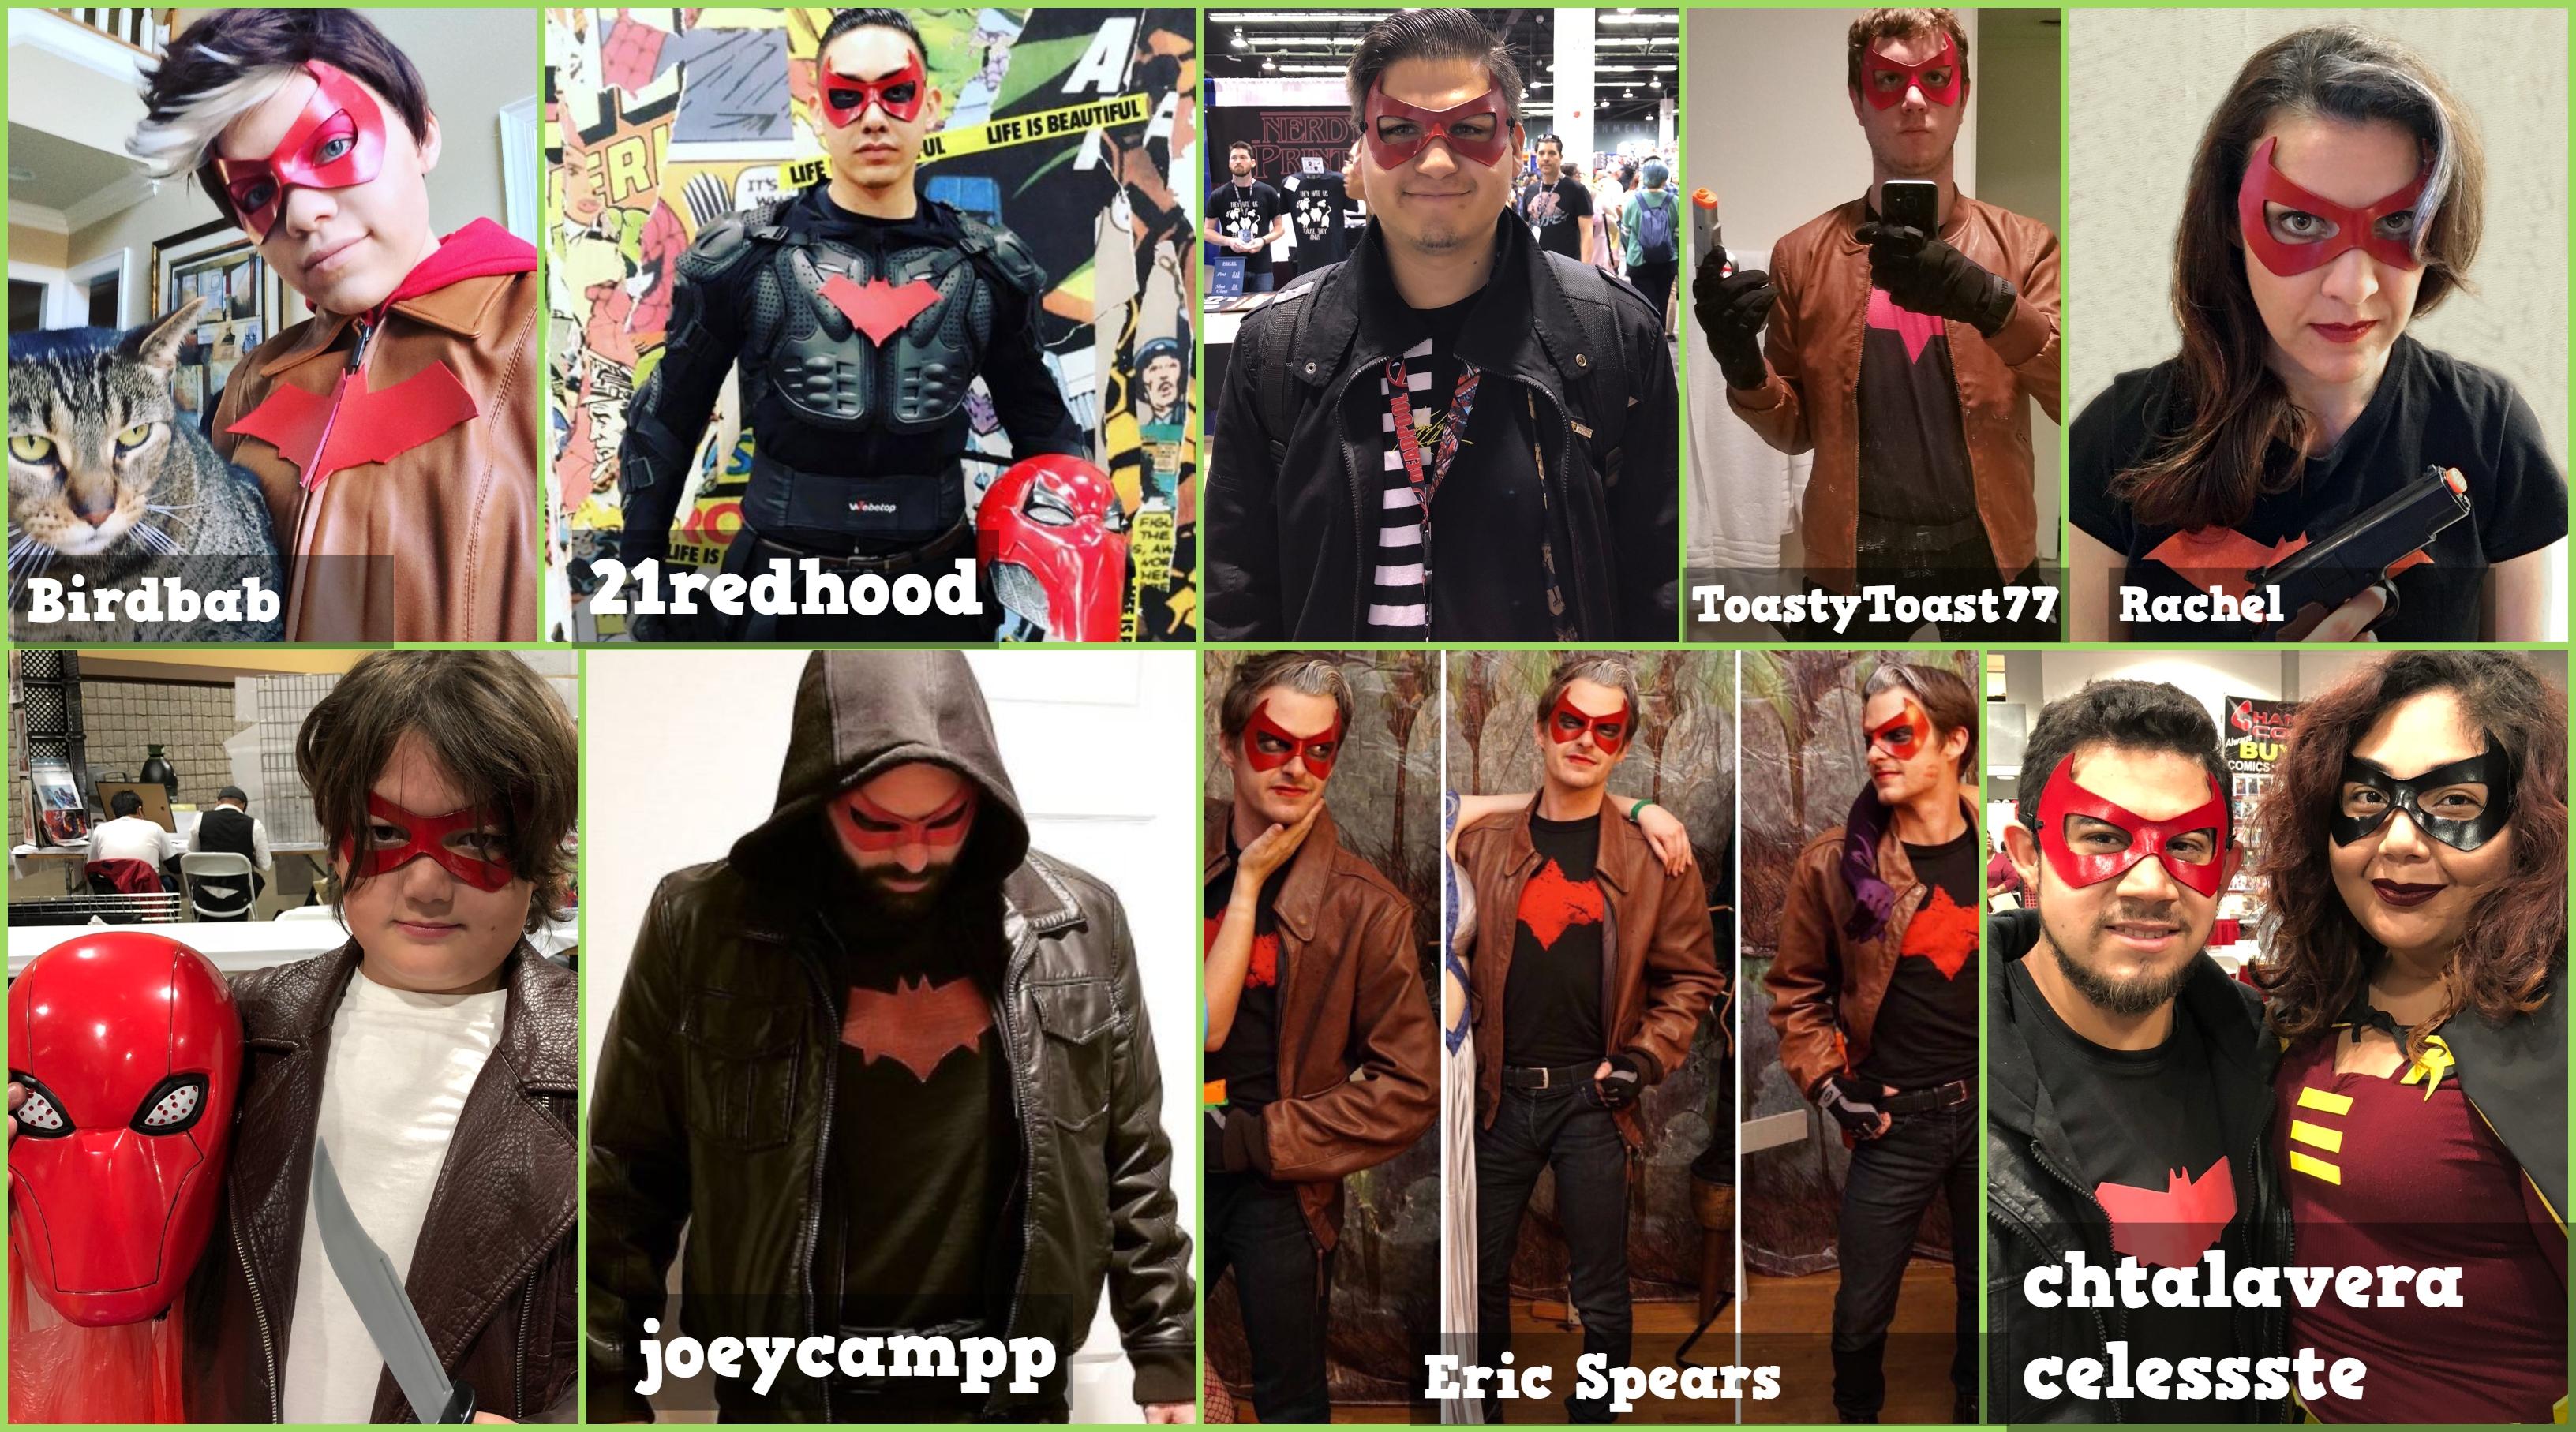 red-hood-jason-todd-cosplay2-collage.jpg